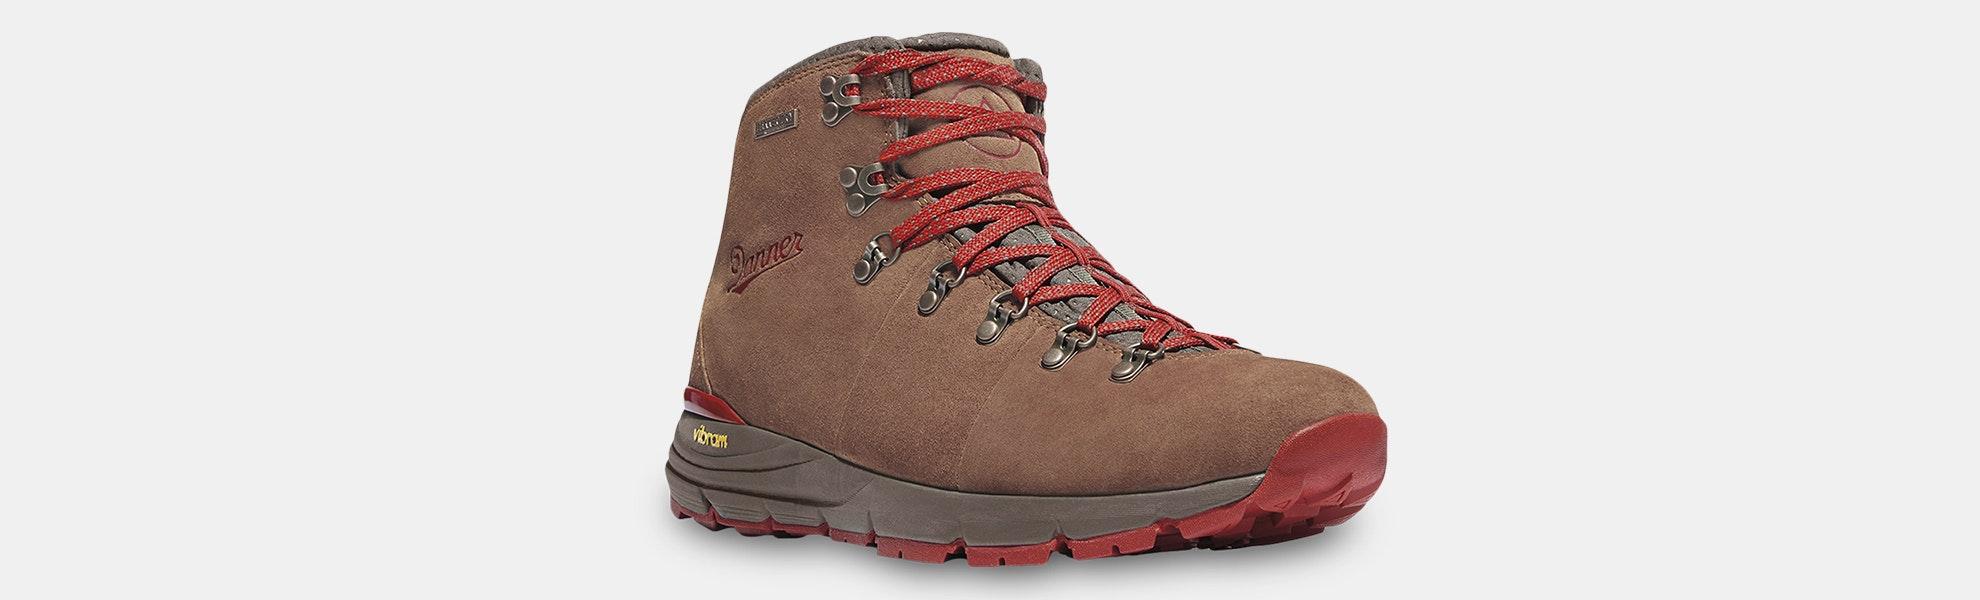 "Danner Mountain 600 4.5"" Boots"